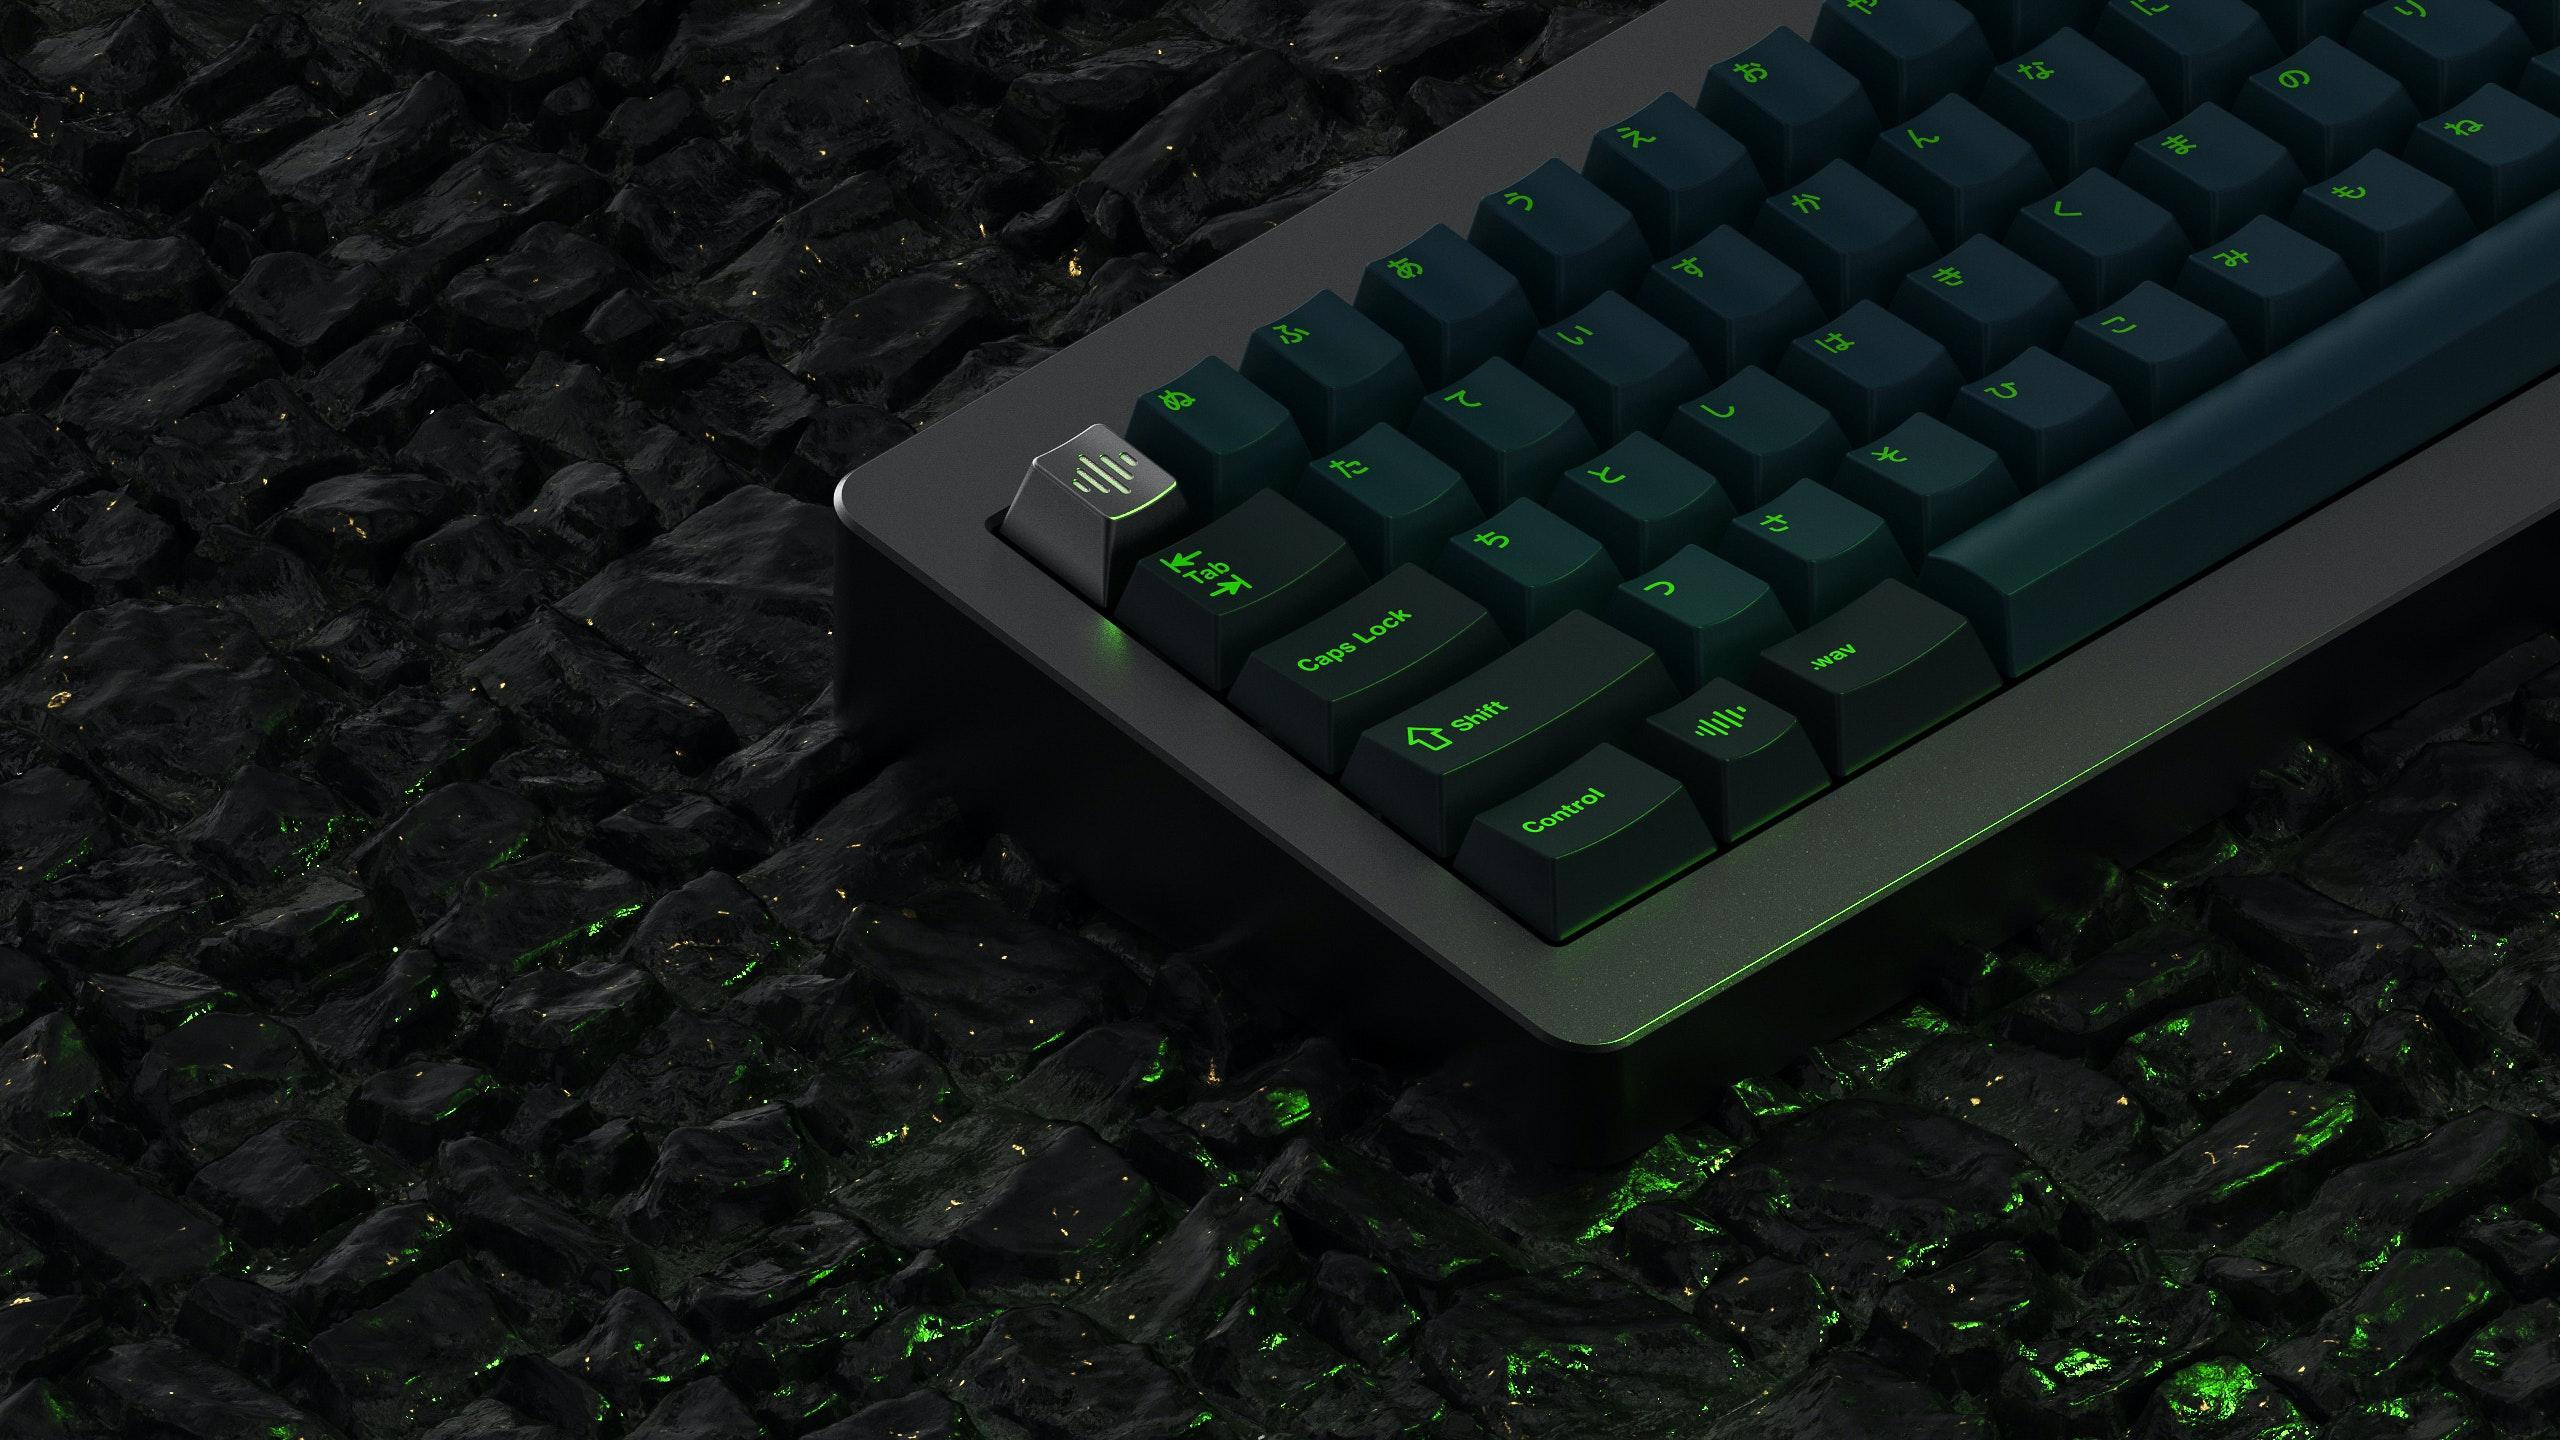 Rama keycaps